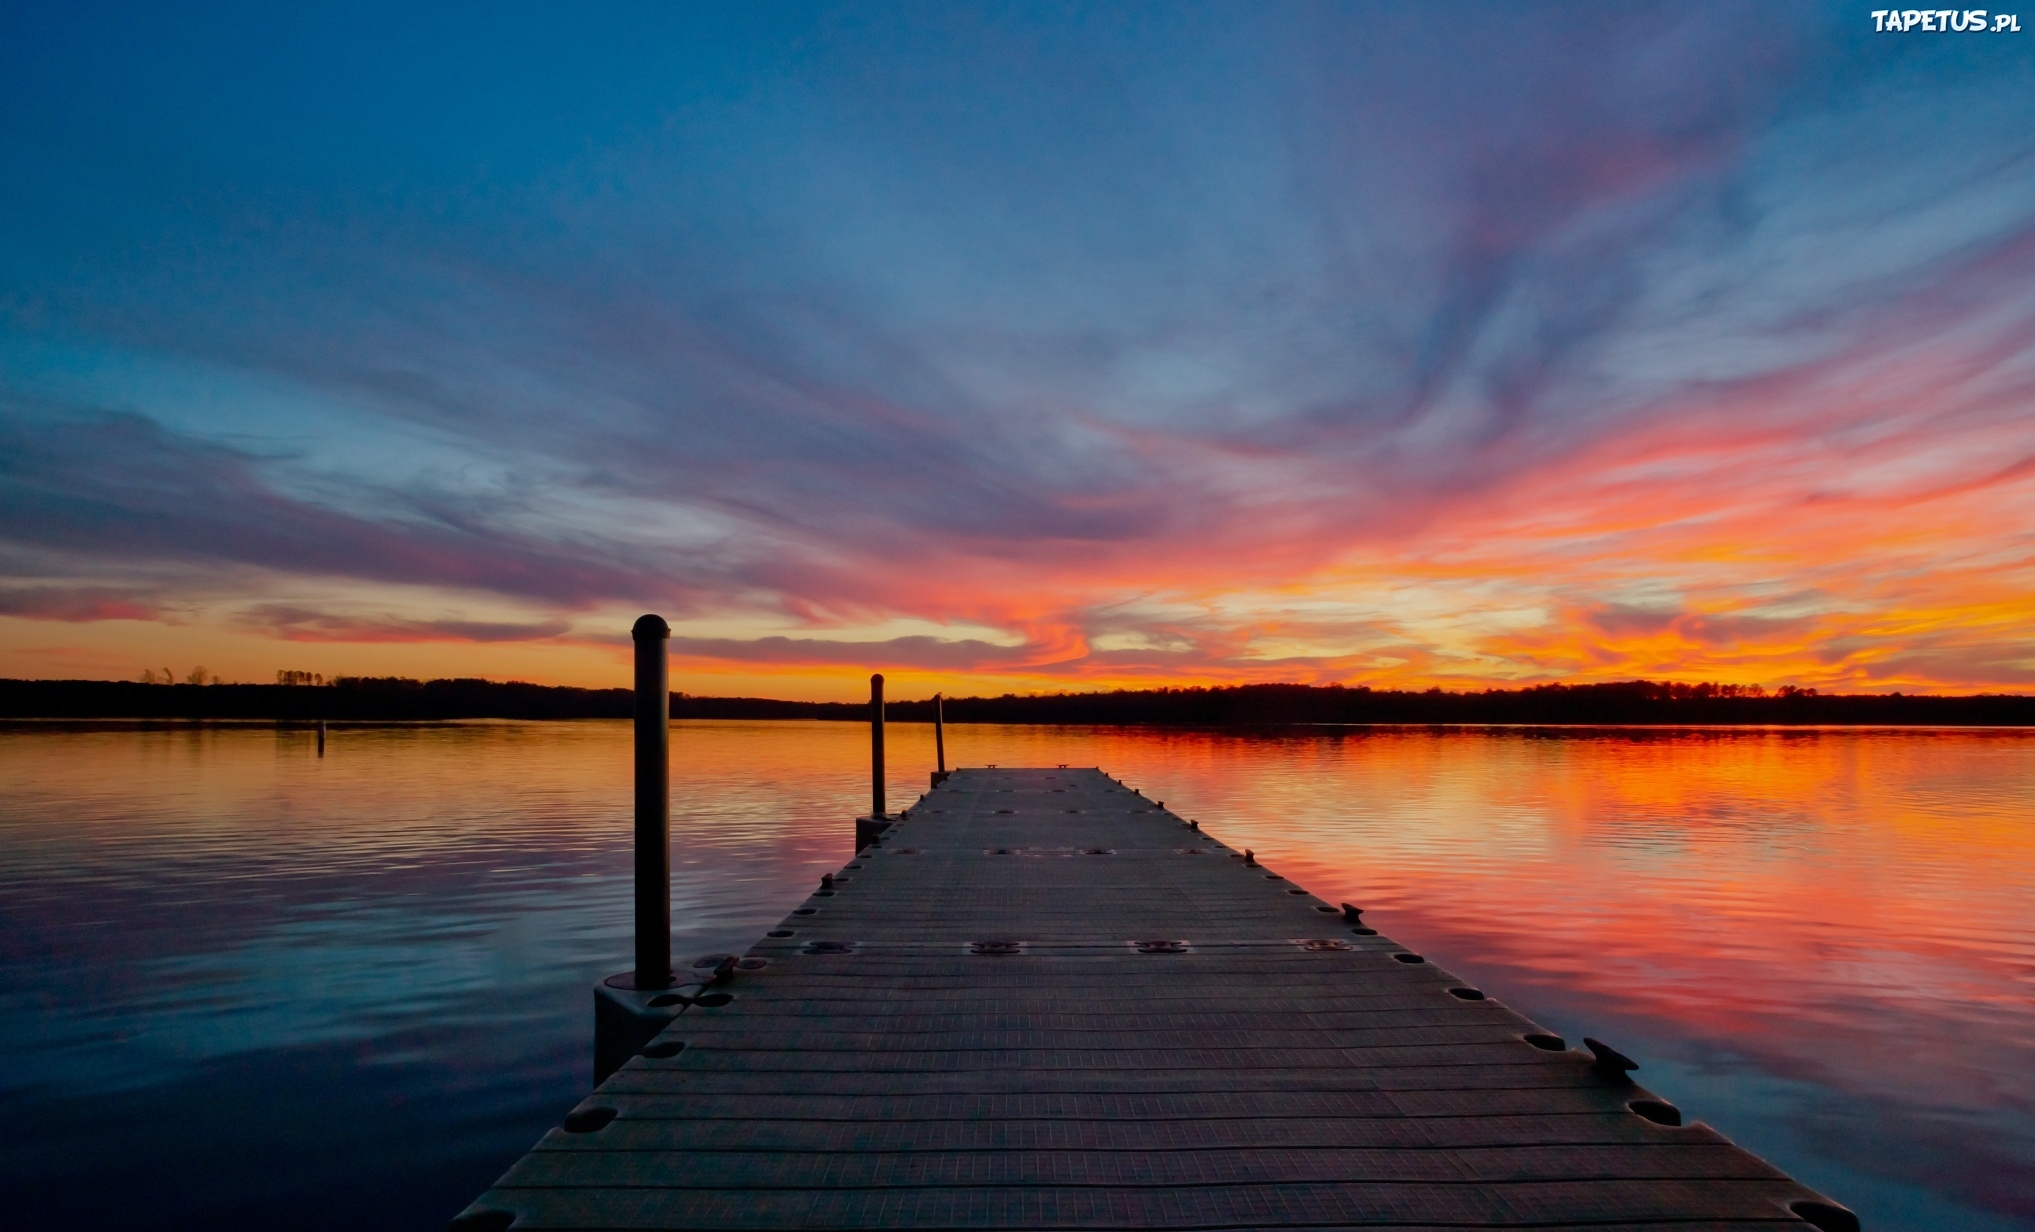 мост закат озеро небо без смс